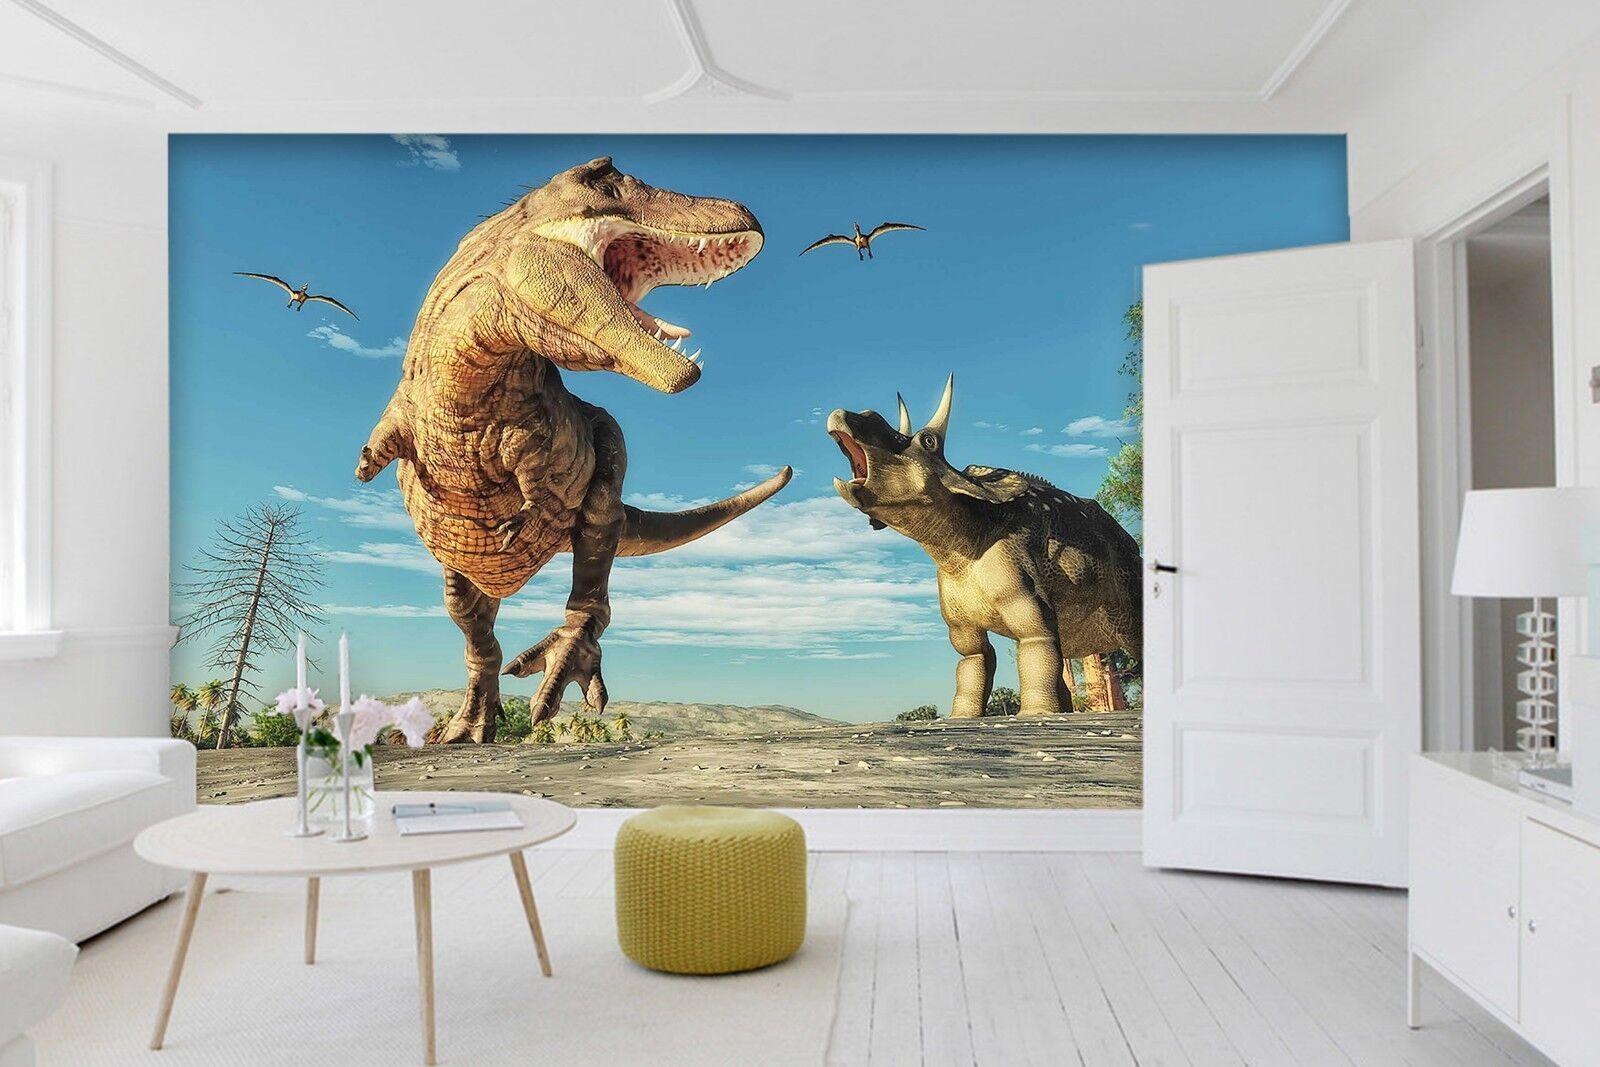 3D Dinosaur Century 23 Wallpaper Mural Print Wall Indoor Wallpaper Murals UK